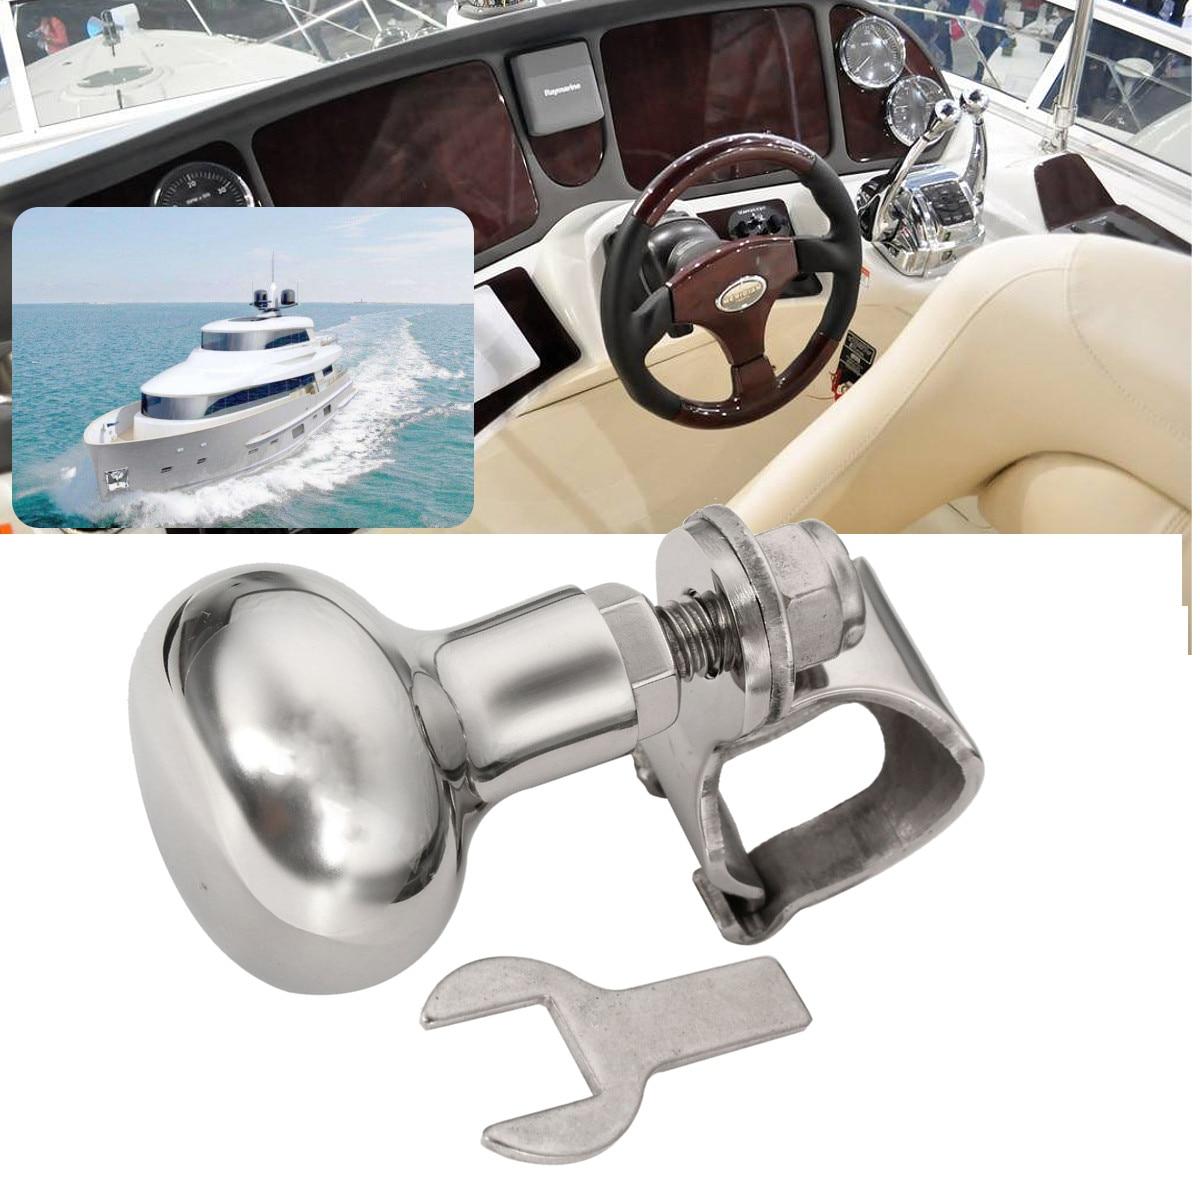 Marine 316 Stainless Steel Steering Wheel Knob Wheel Power Handle Ball Grip Knob Turning Helper Hand Control Marine Boat Yact Marine Hardware     -